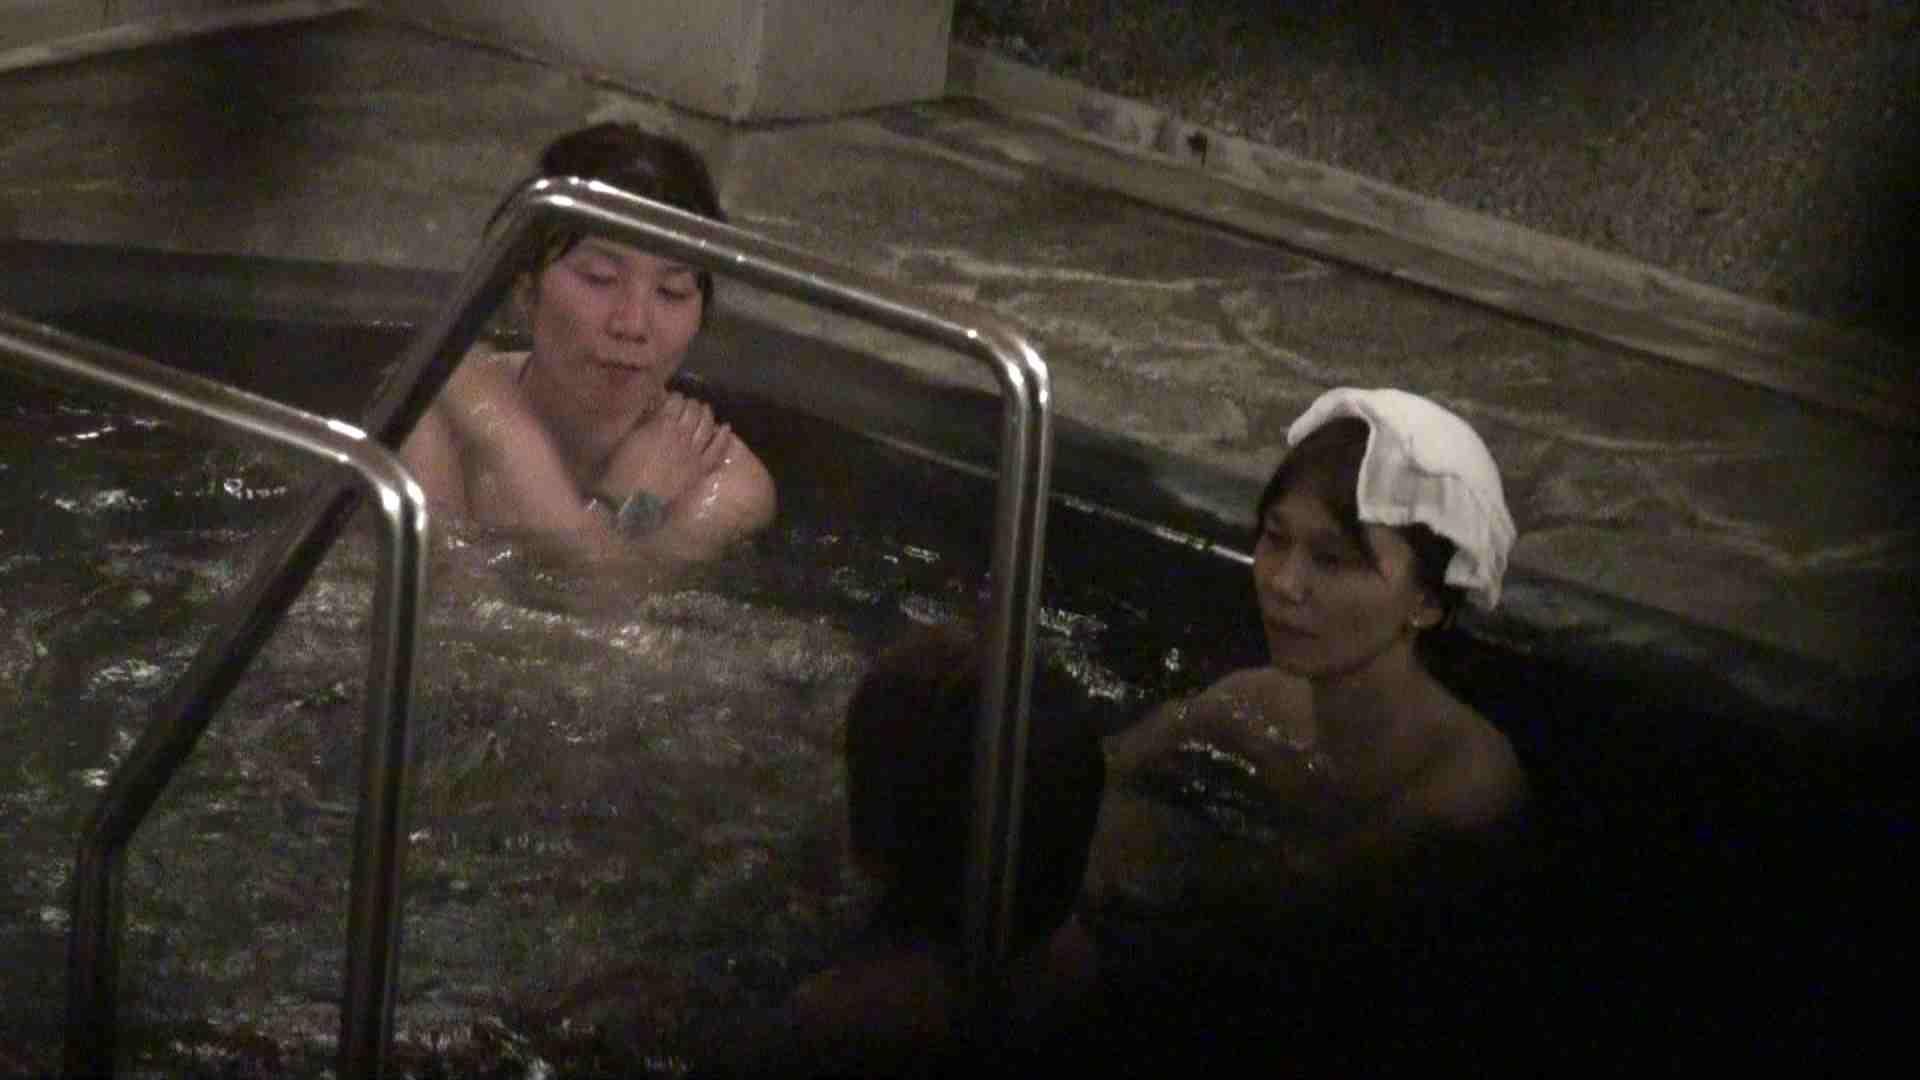 Aquaな露天風呂Vol.419 盗撮 | OLセックス  99画像 40